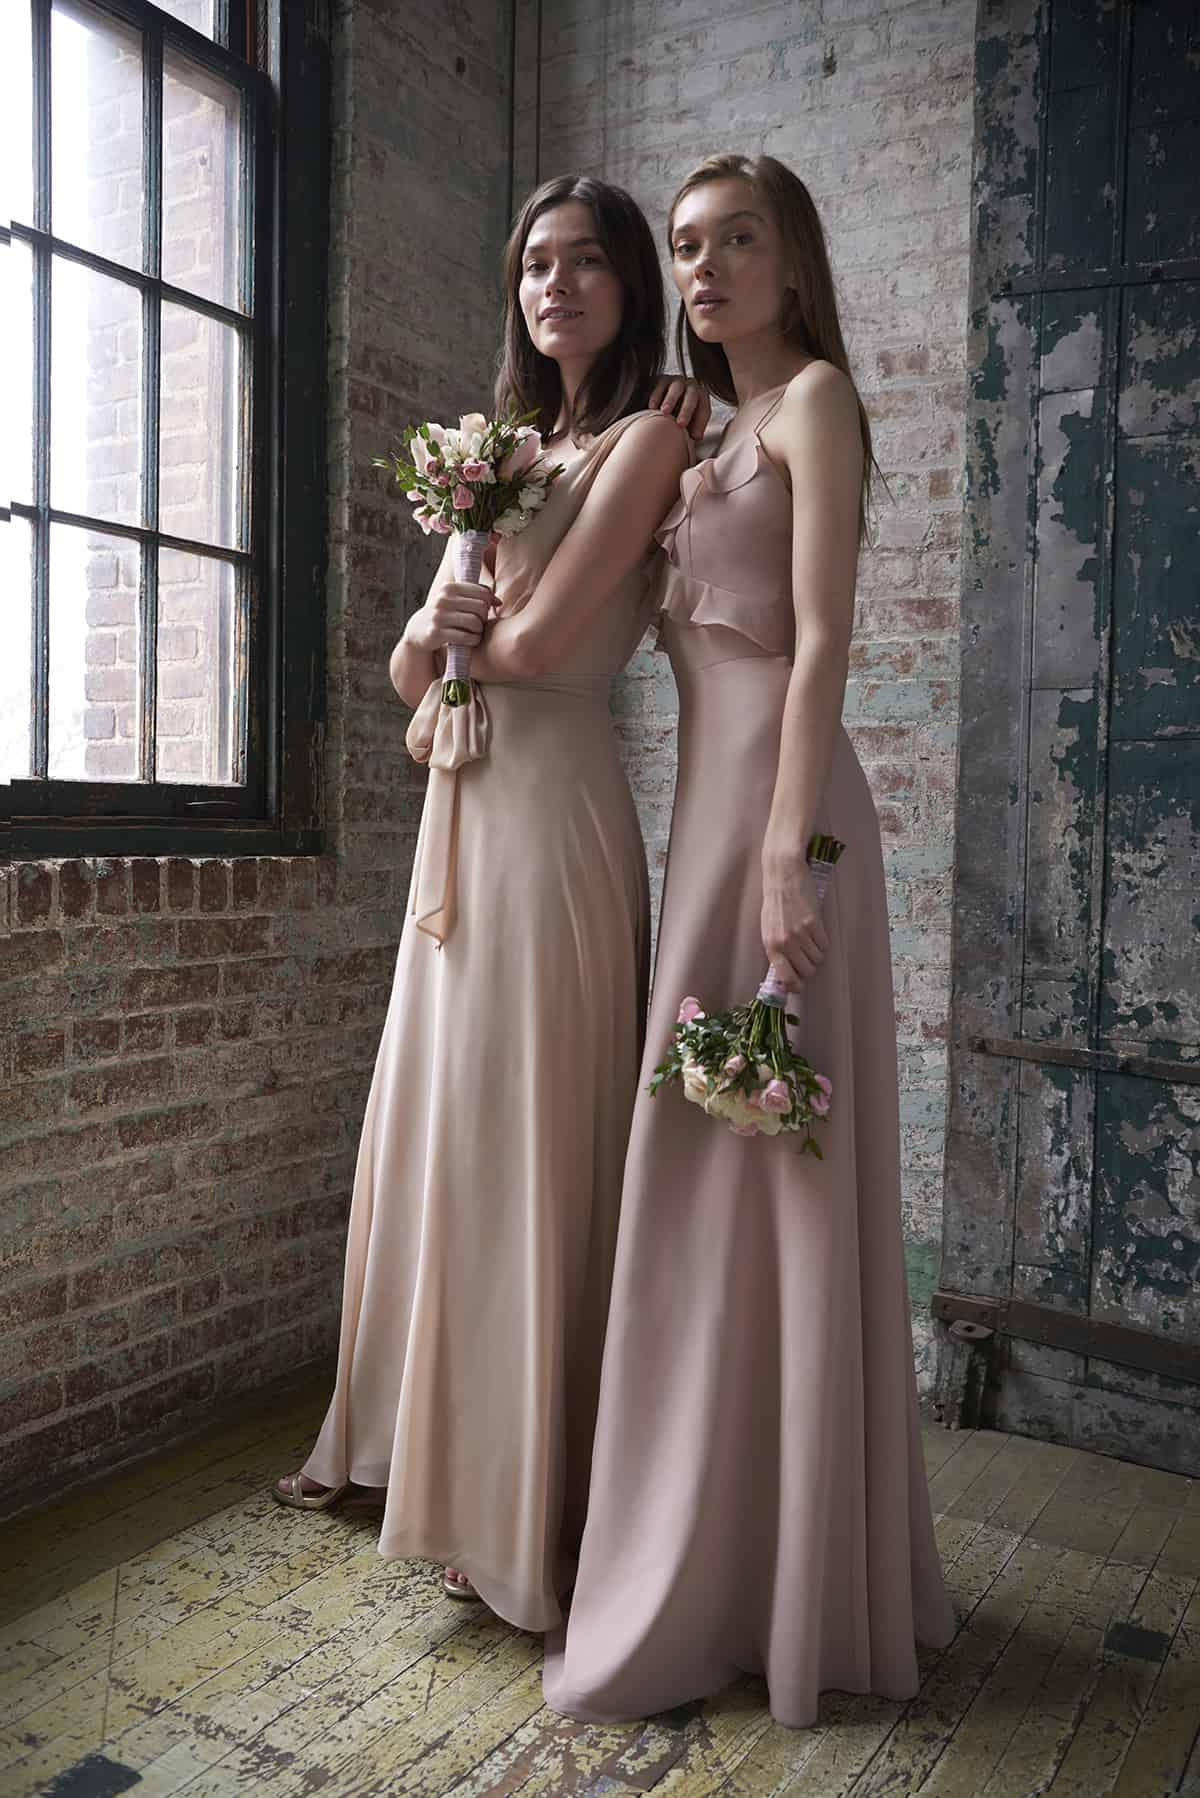 1513dd3f6f78 Monique-Lhuillier-Bridesmaids-Spring-2020-Collection-02. Monique-Lhuillier -Bridesmaids-Spring-2020-Collection-02